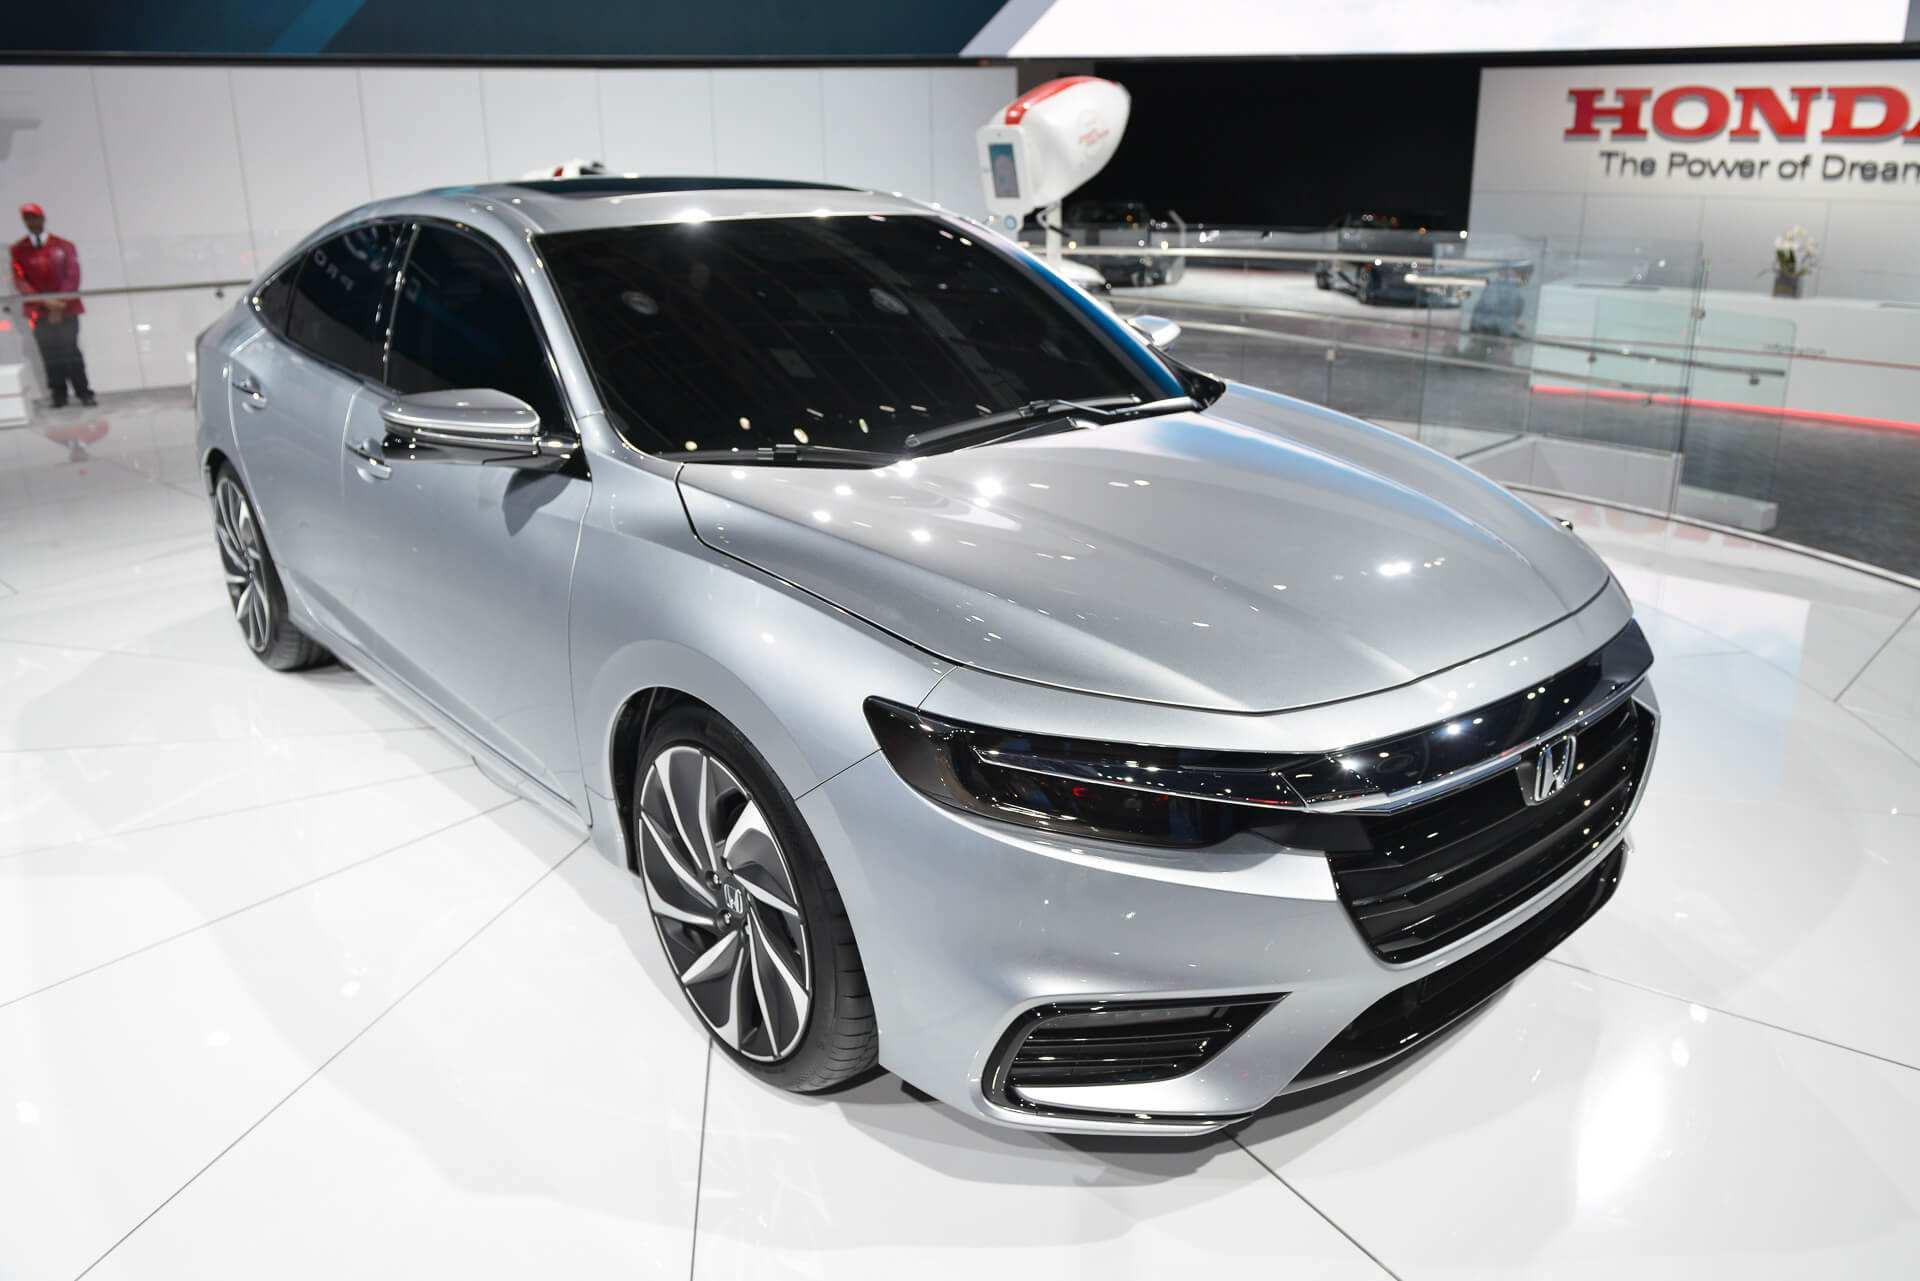 96 Concept of Honda Lineup 2020 Engine by Honda Lineup 2020